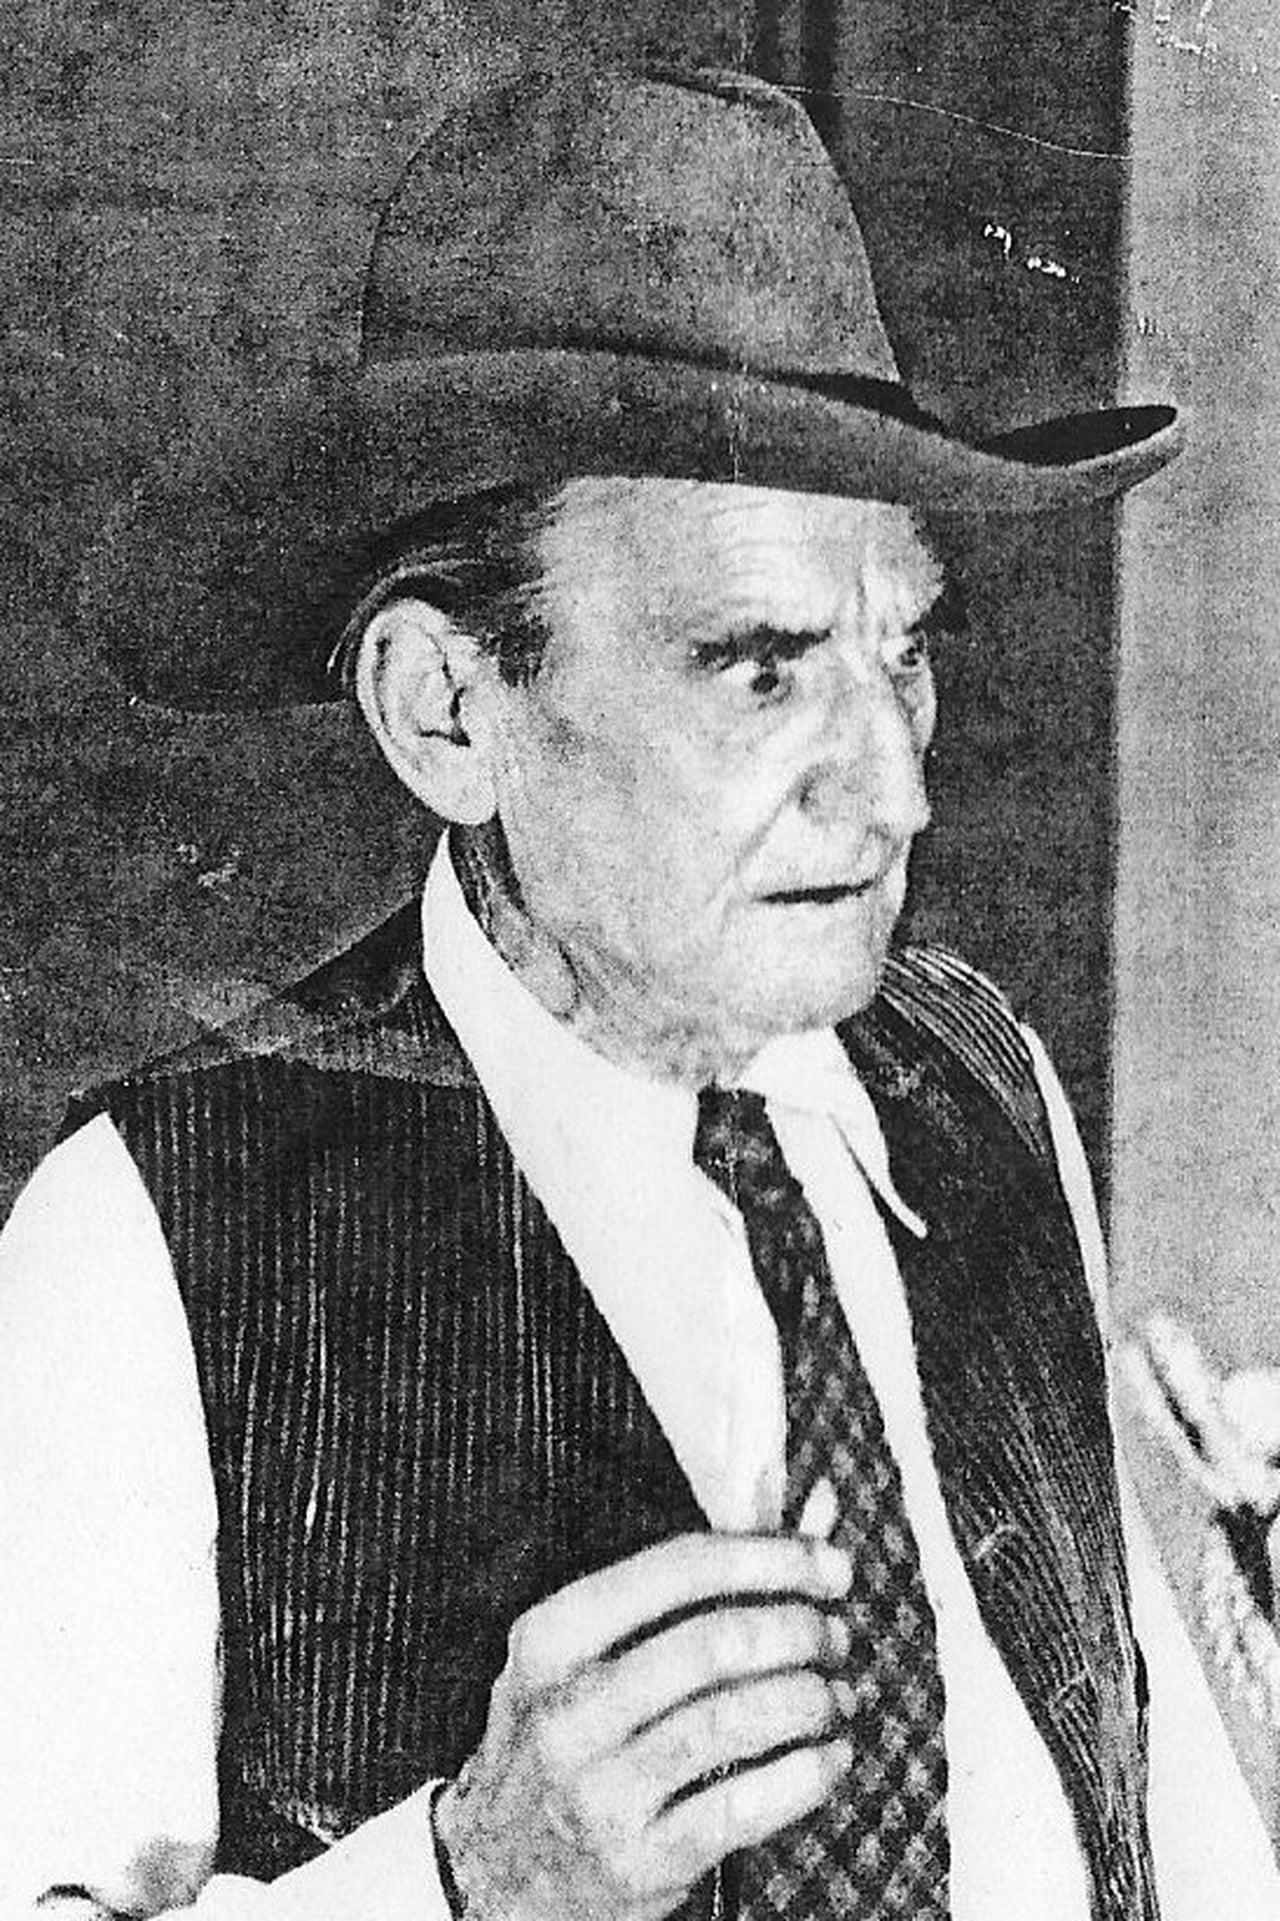 Otto Hoffman